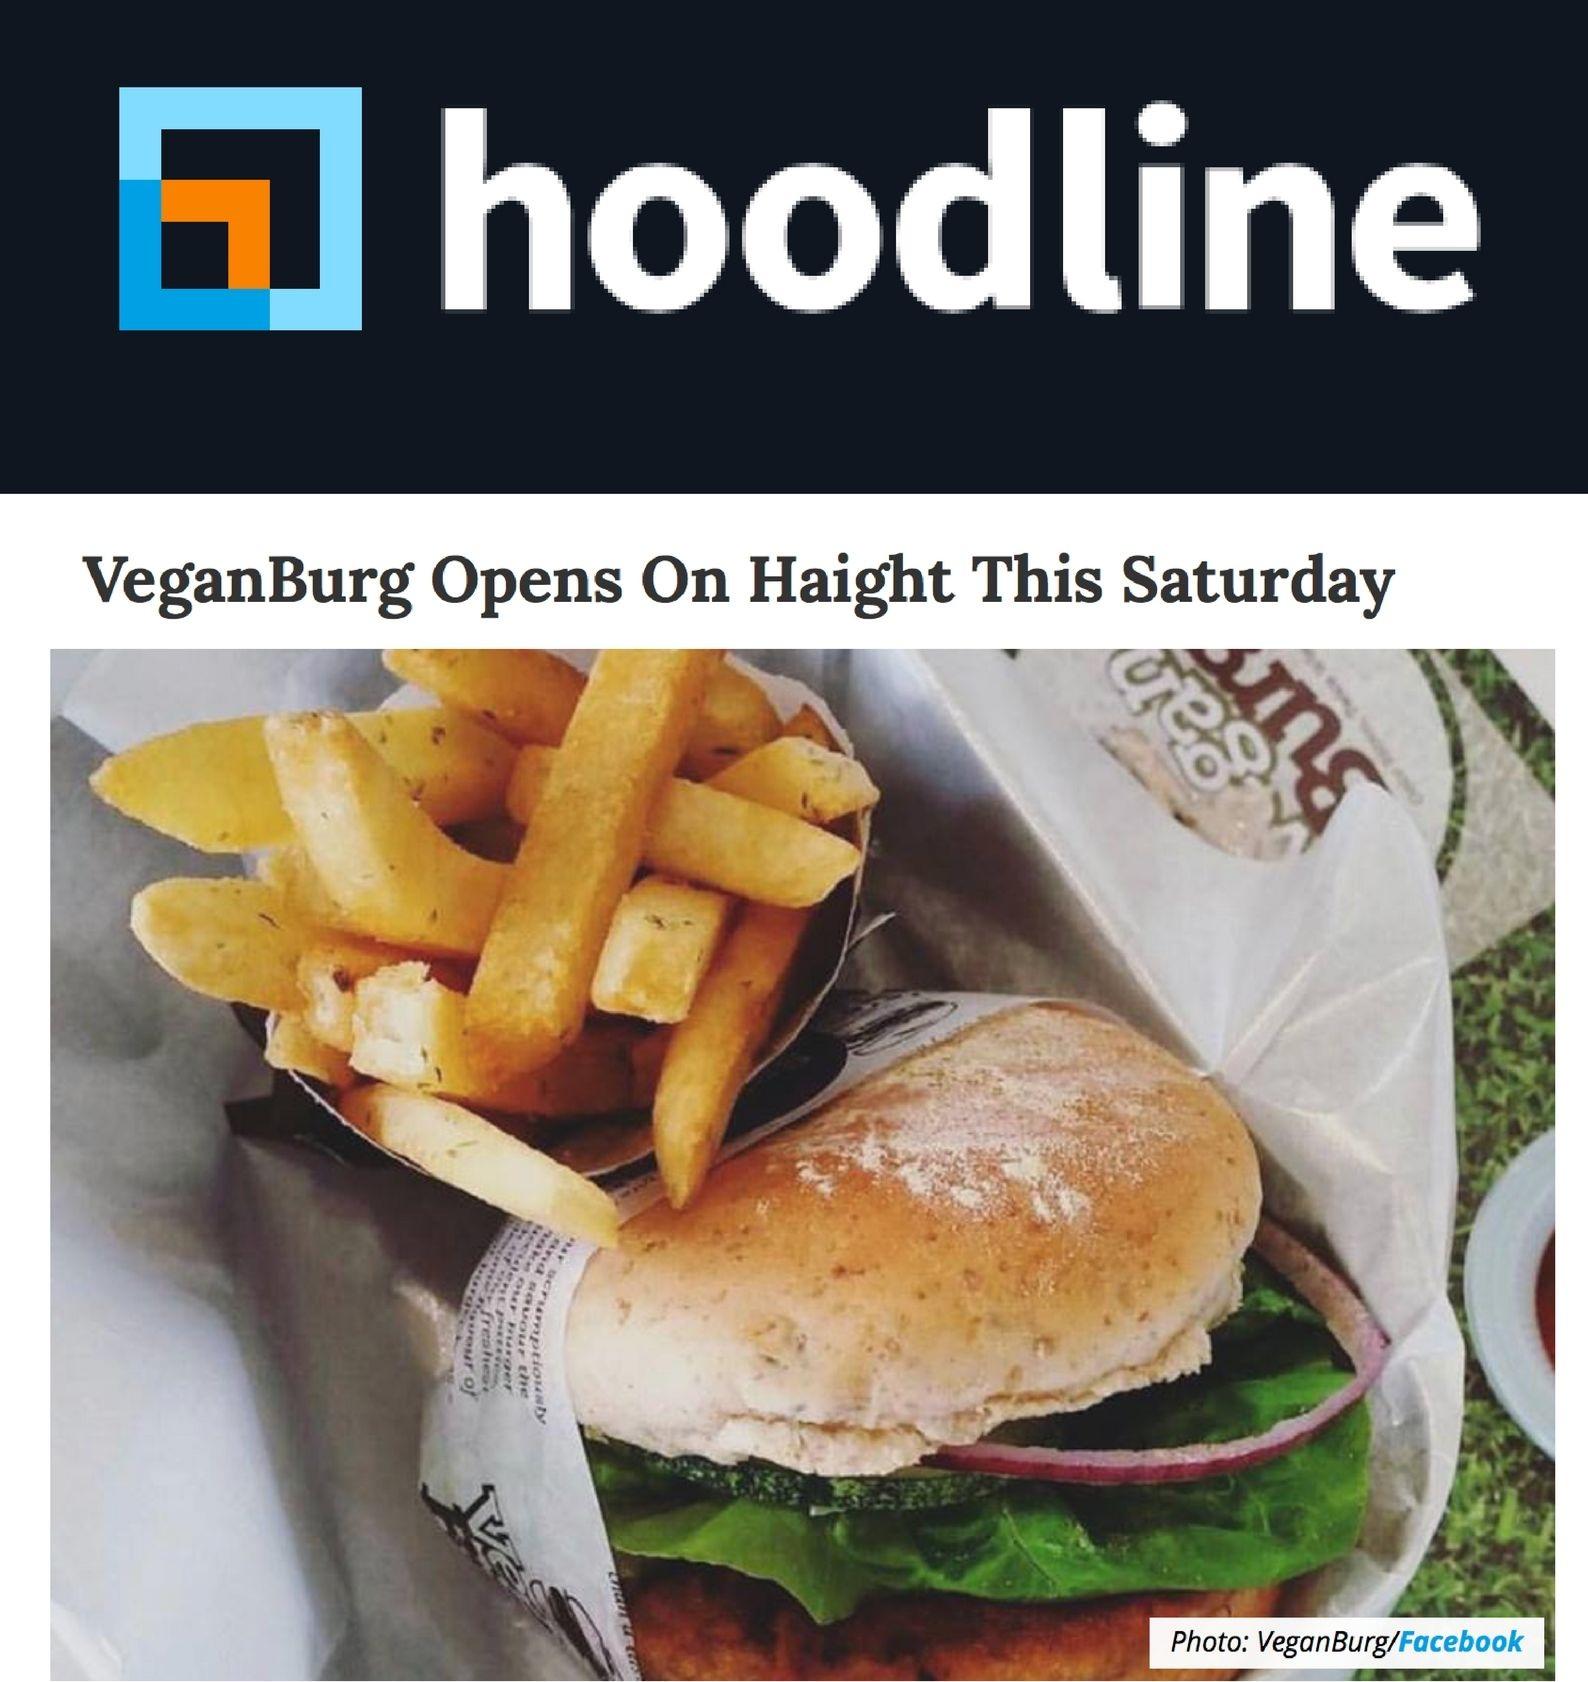 Hoodline_+VeganBurg+Opens+On+Haight+This+Saturday.jpg